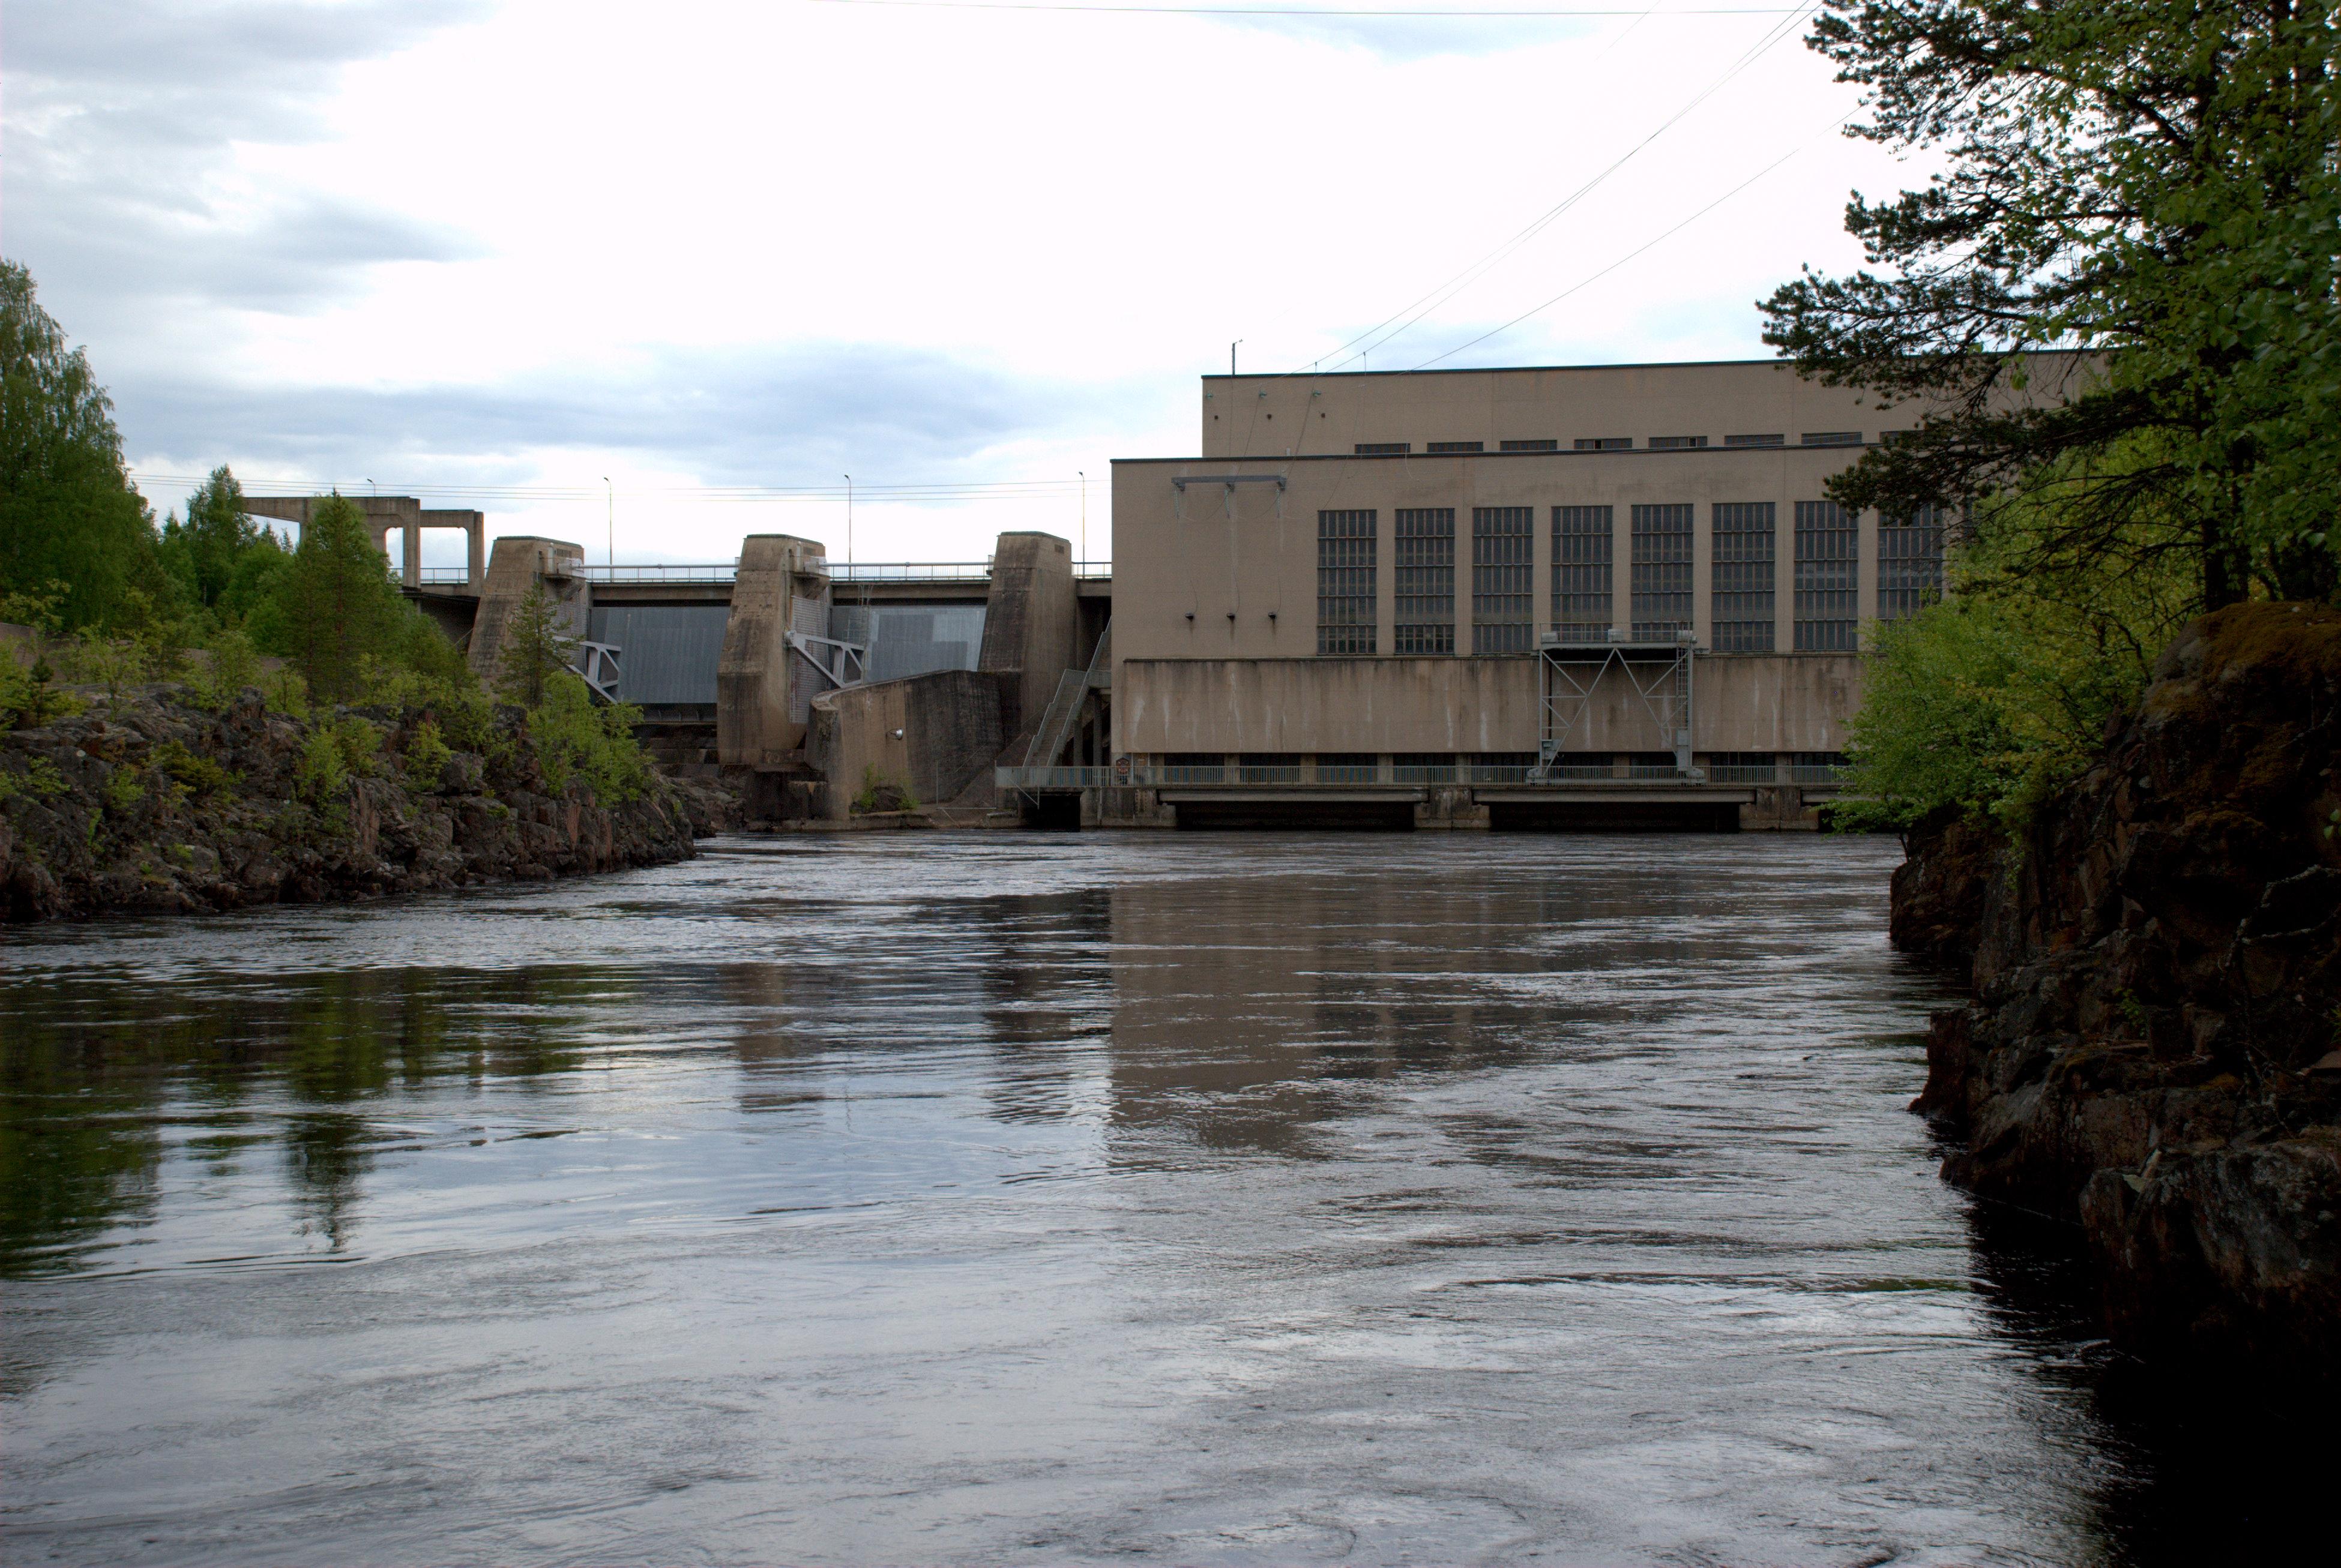 Jylhämä hydro power plant